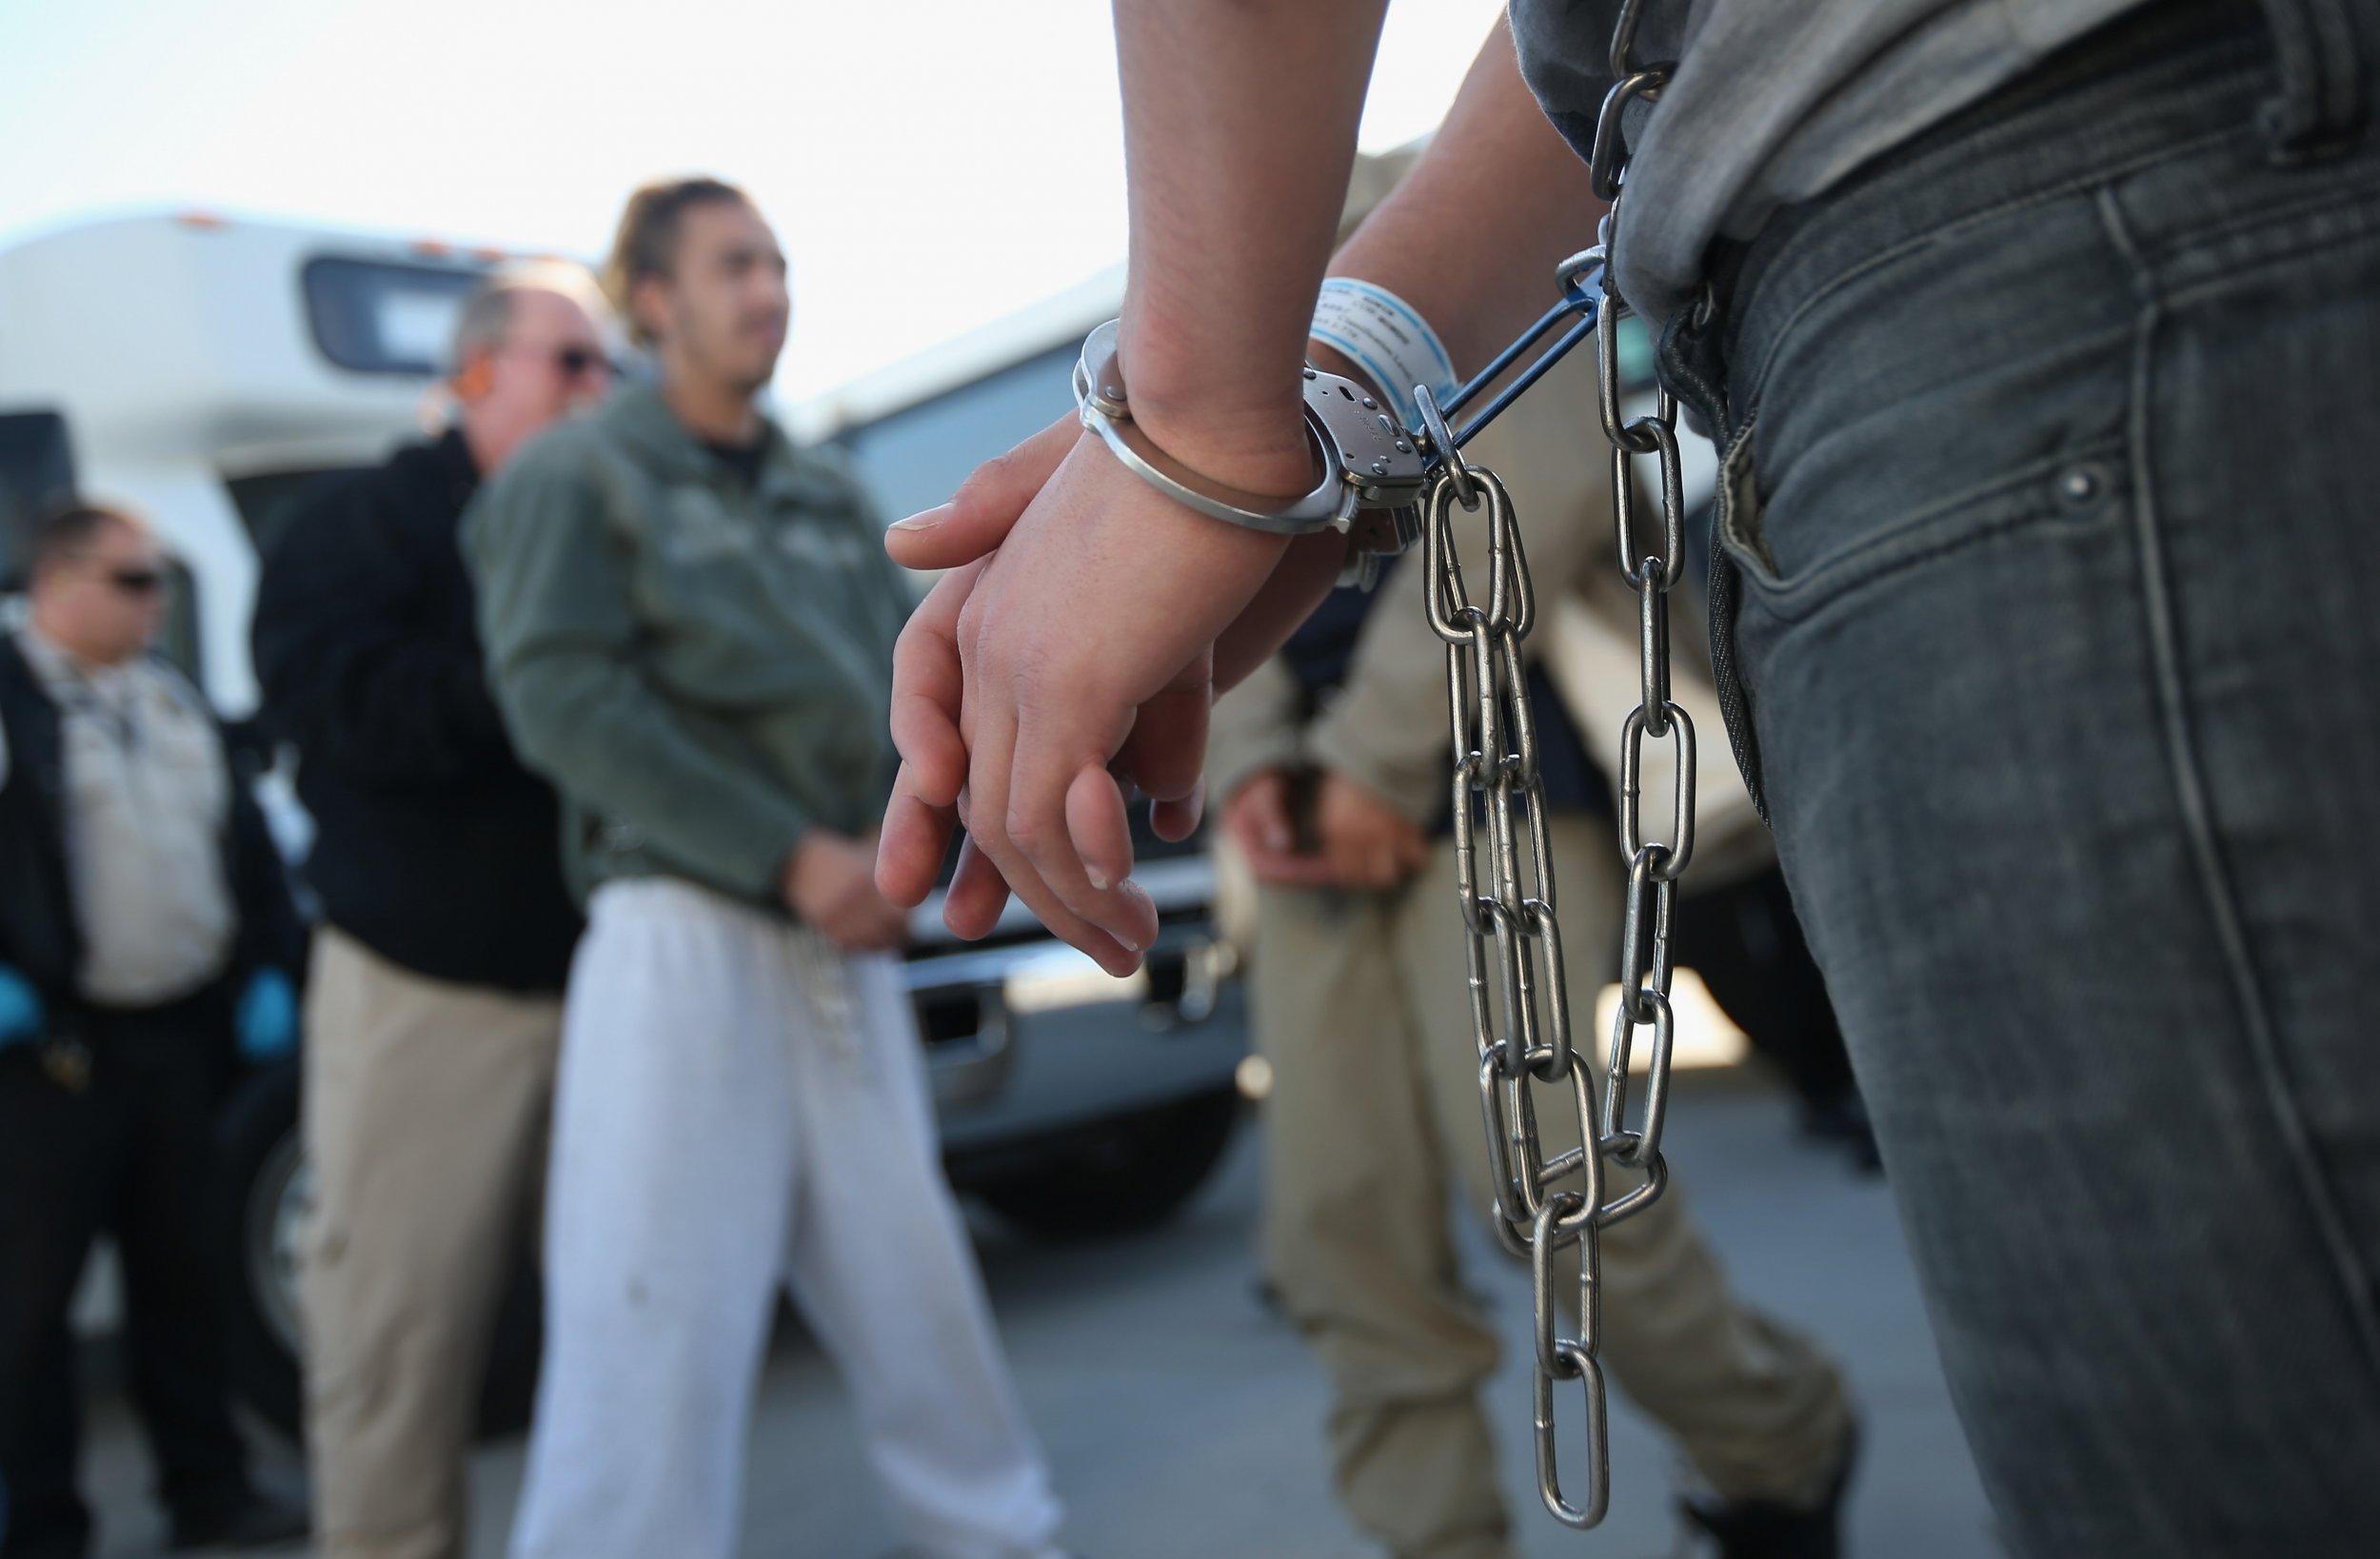 09_30_ICE arrests